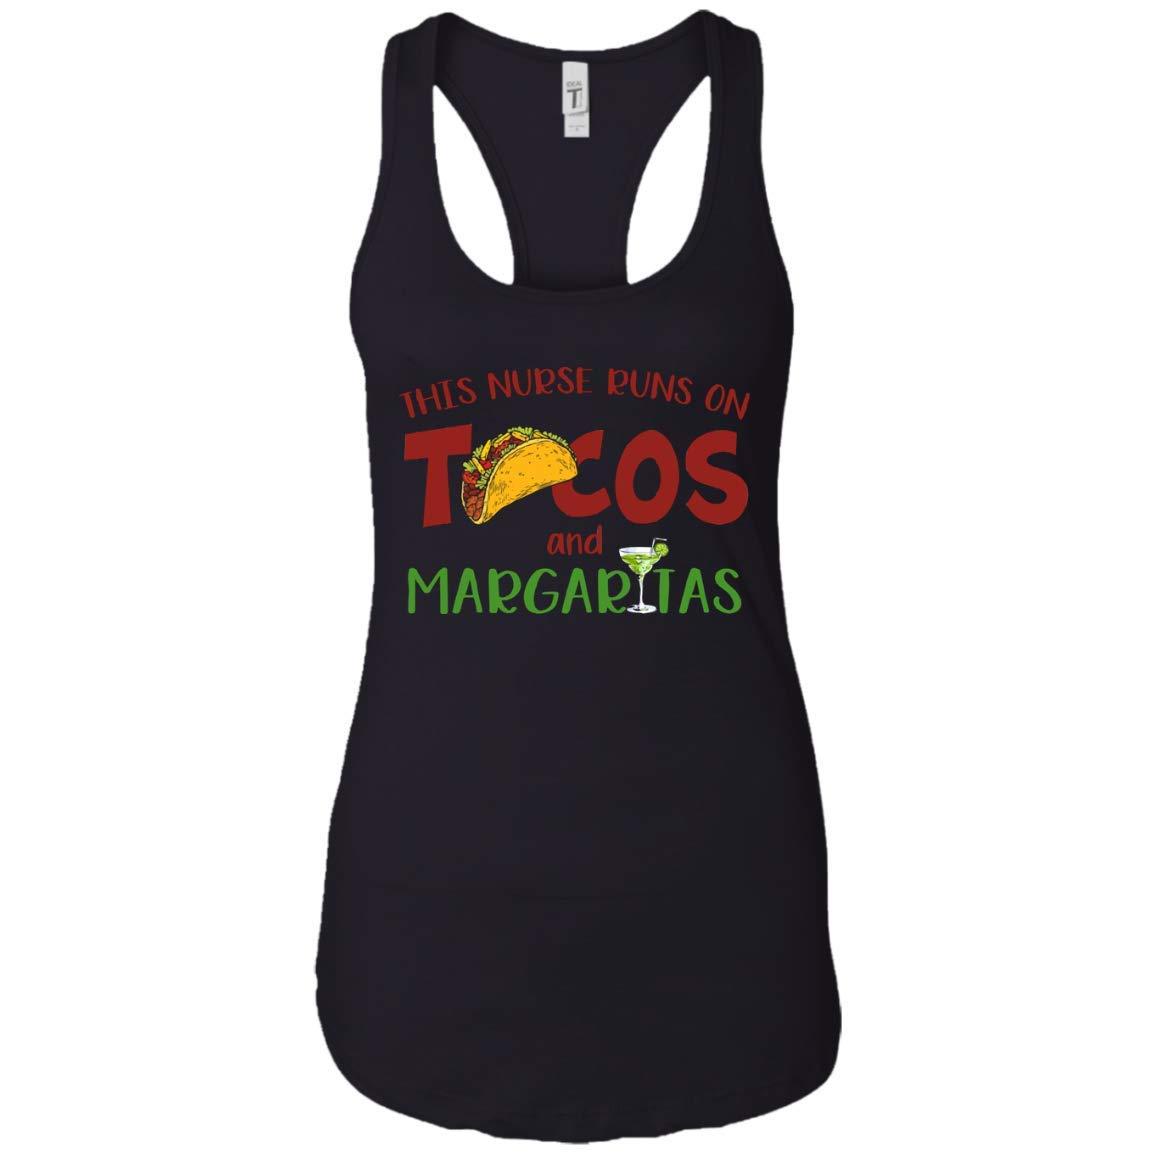 Mktee This Nurse Runs On Tacos Margaritas Tshirt Nurse Gifts Tank Top For Girls Mother S D